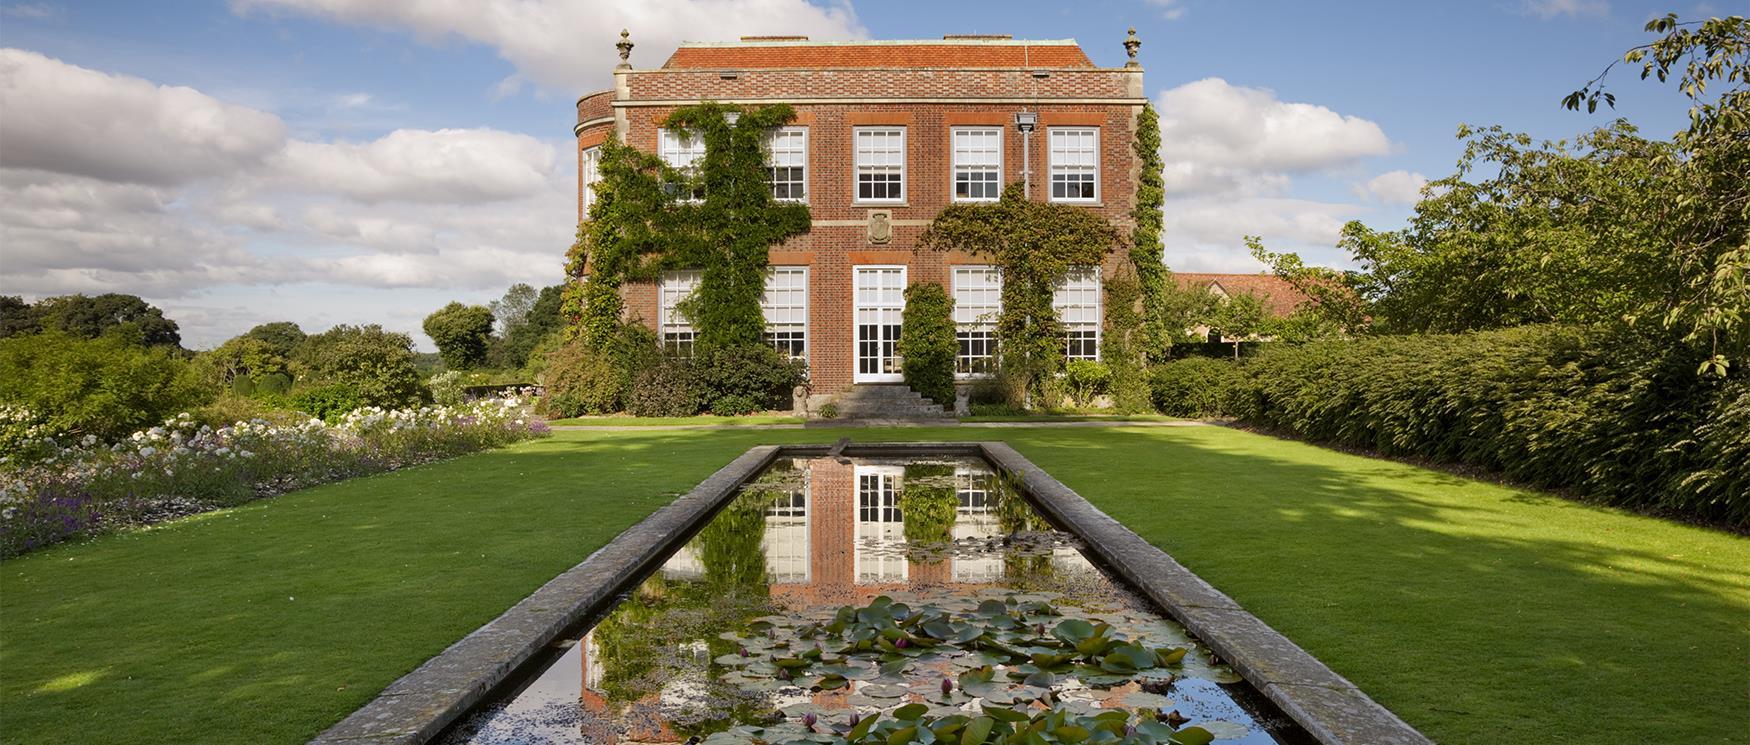 Hinton Ampner - National Trust